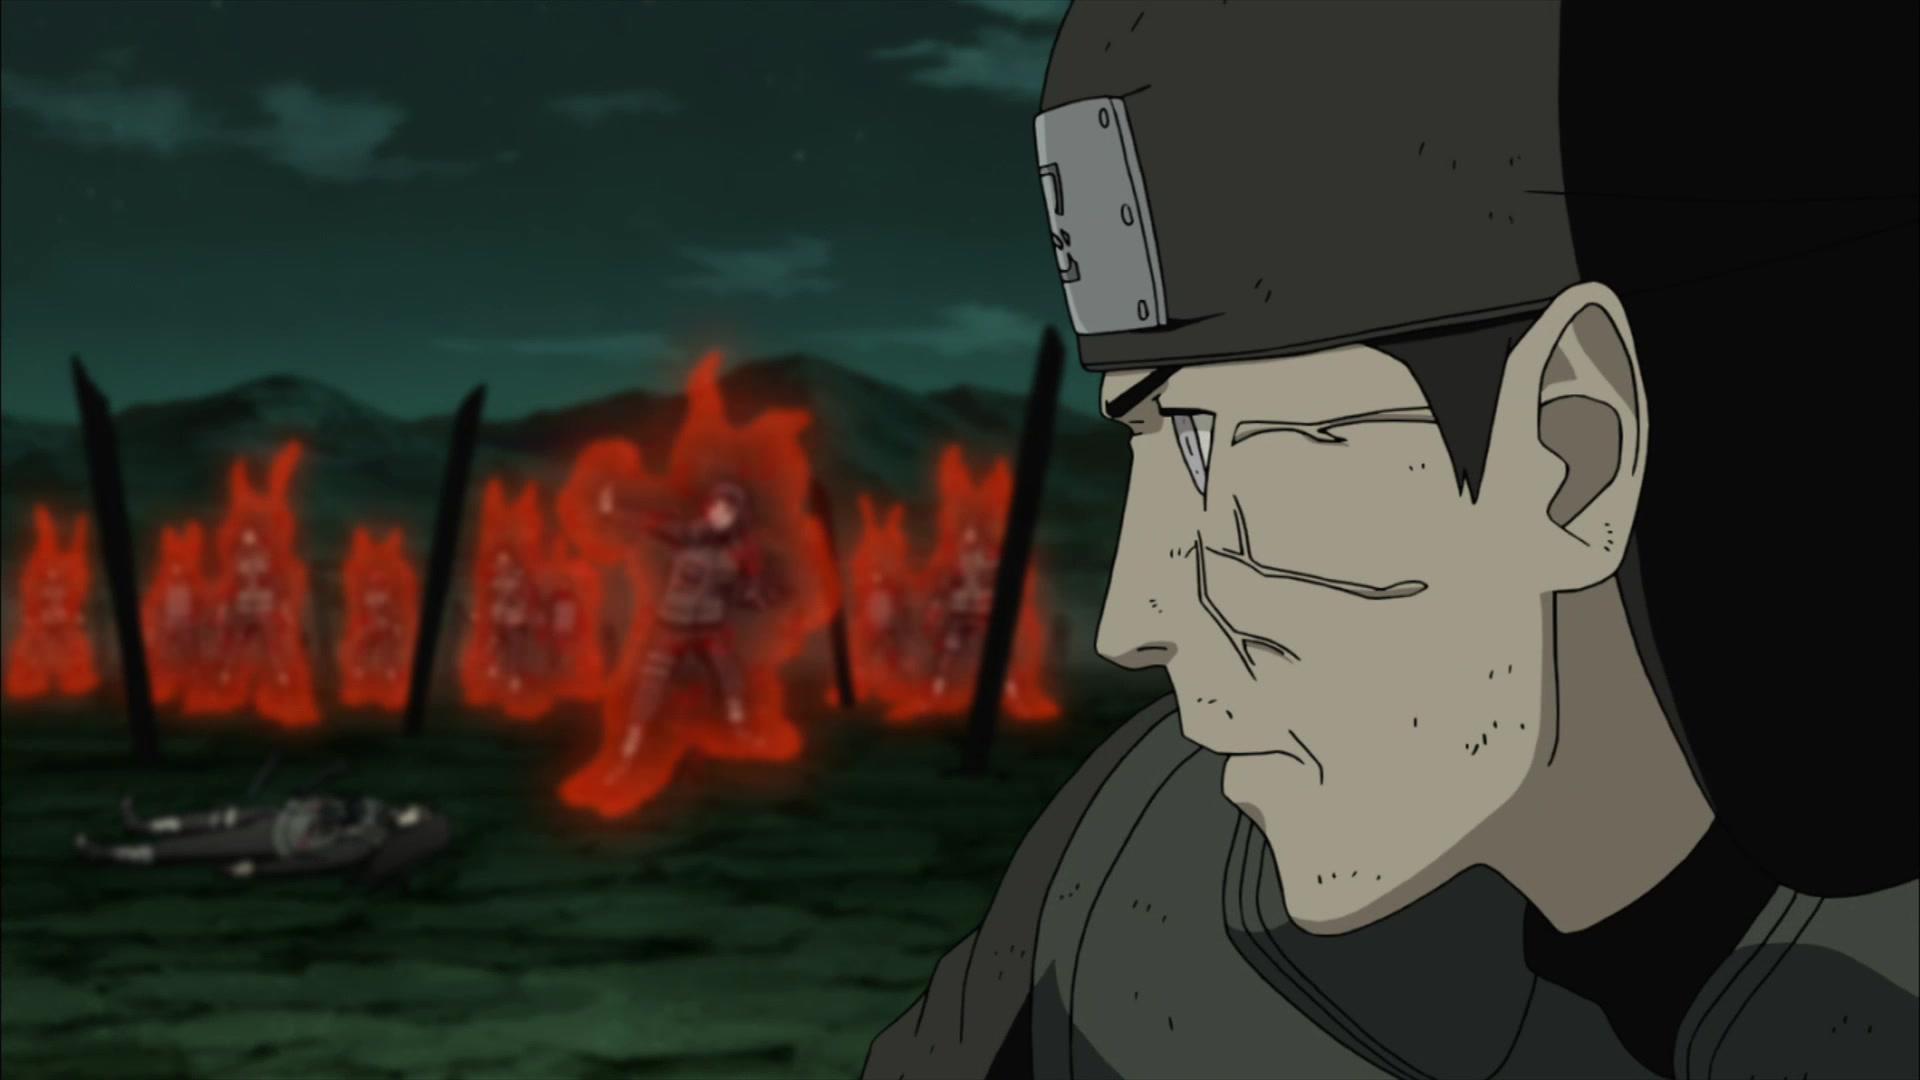 Naruto Shippuden: Season 17 Episode 365, Those Who Dance in